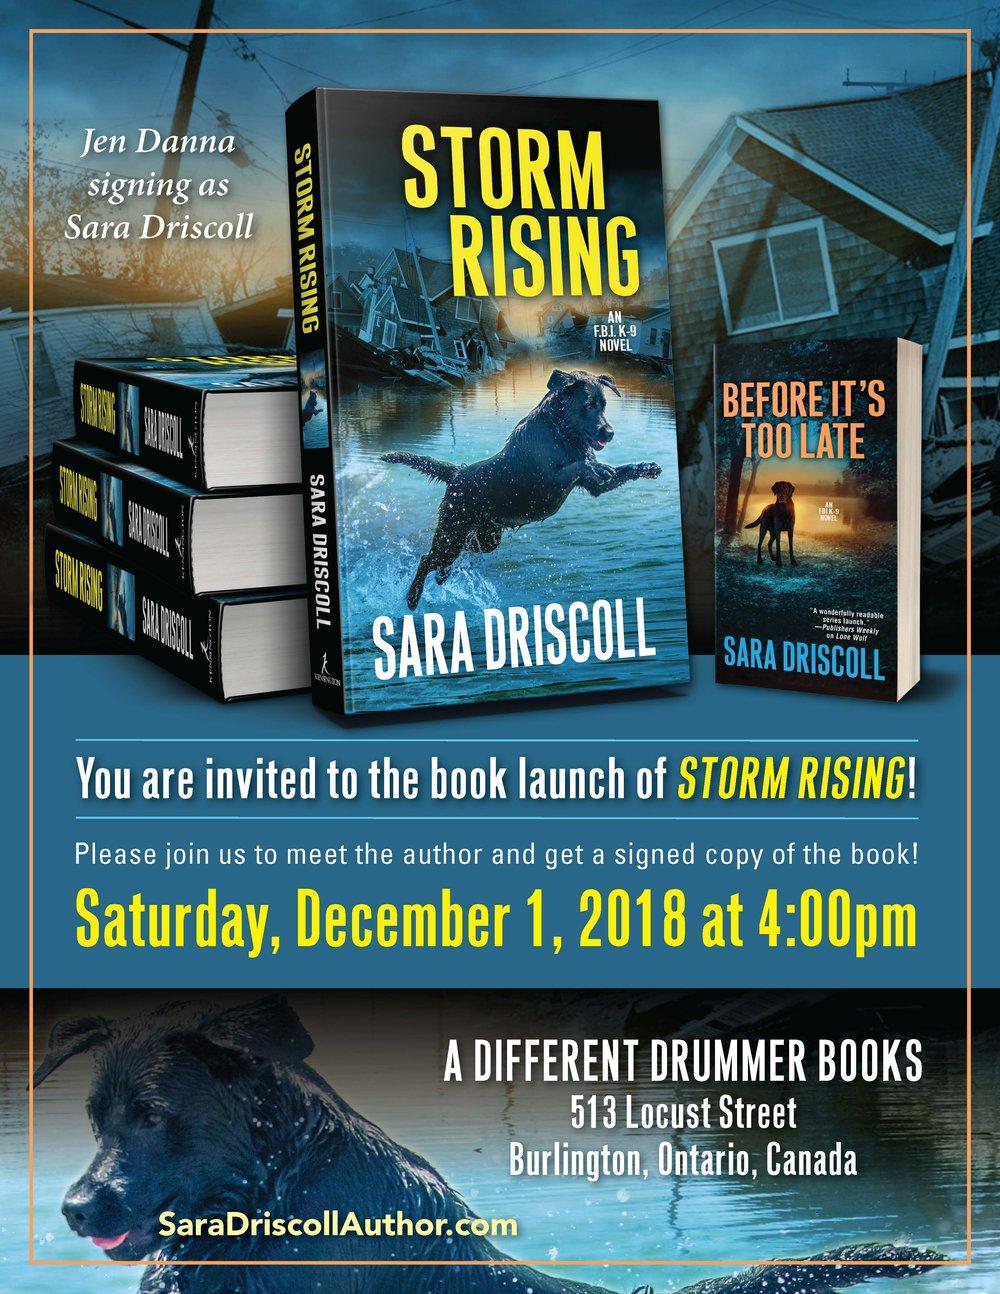 STORM RISING  Driscoll  Event Flyer.jpg